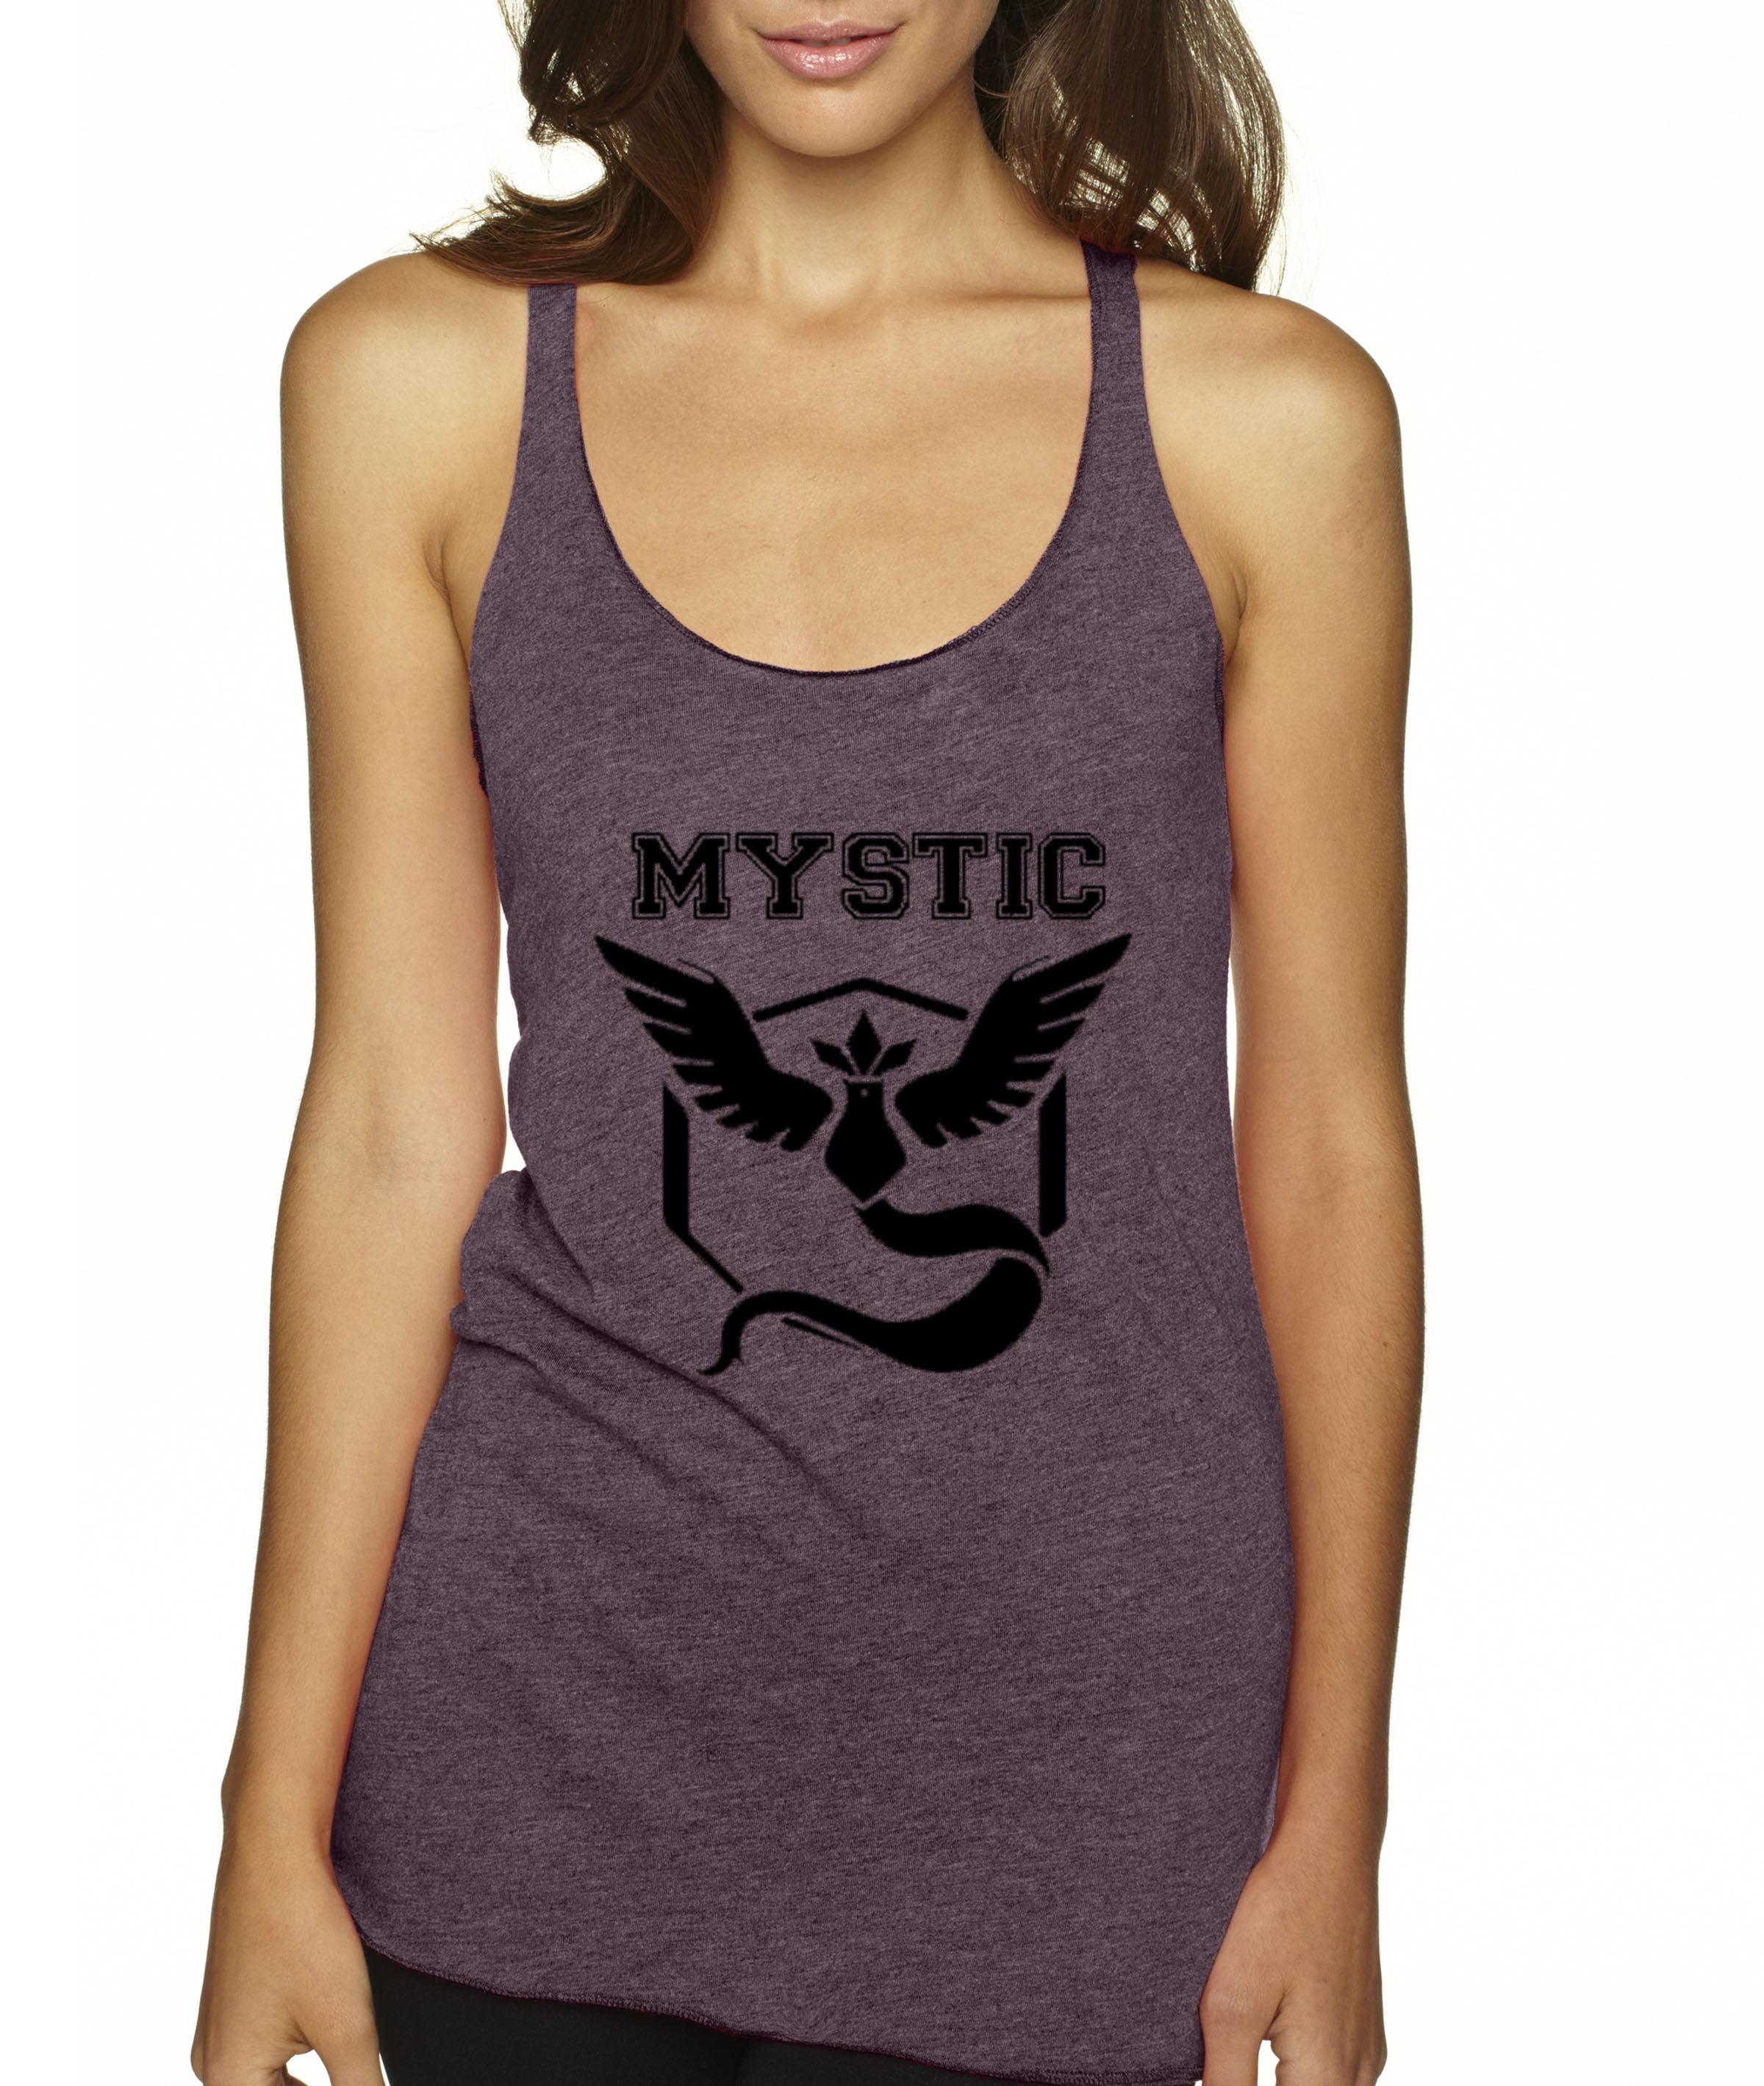 57ab1f13c4222 New Way - New Way 568 - Women s Tank-Top Team Mystic Pokemon Go Articuno -  Walmart.com